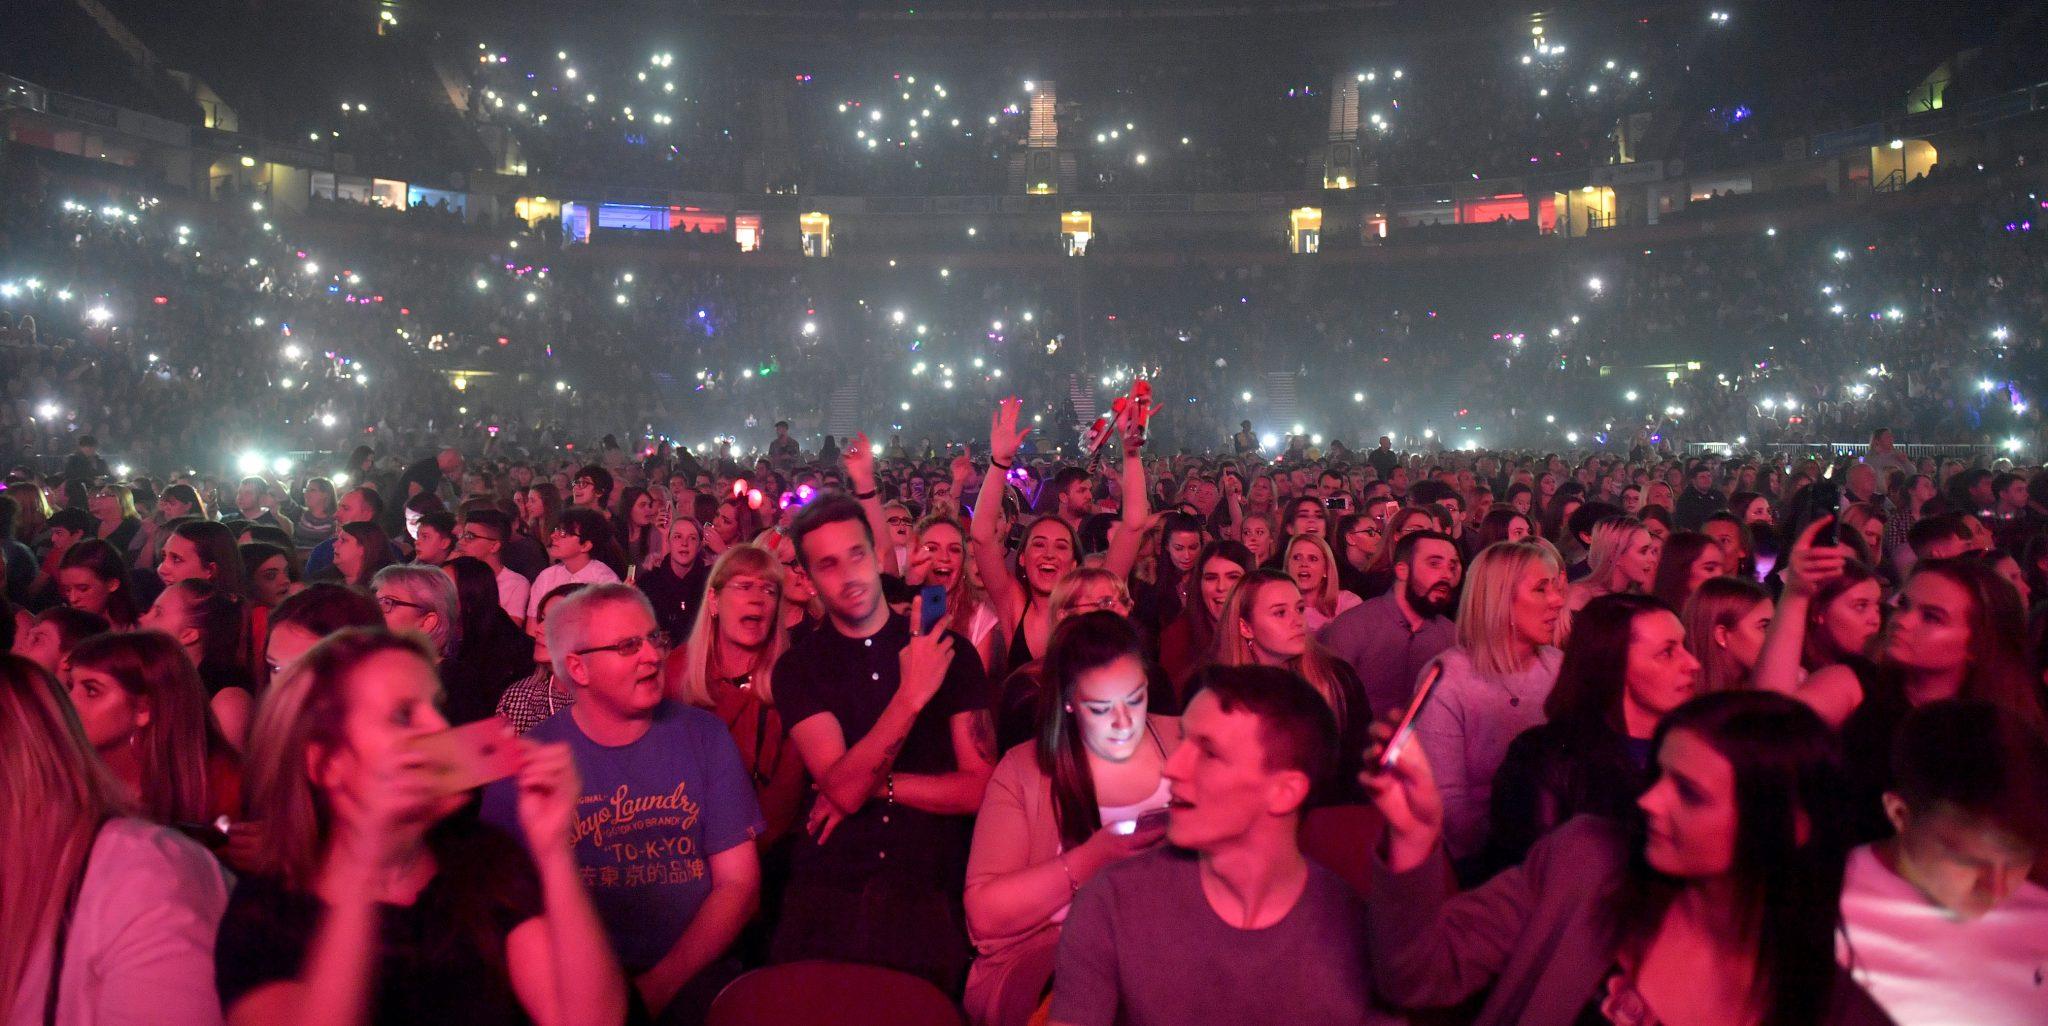 Manchester Arena Gets Digital Ticketing